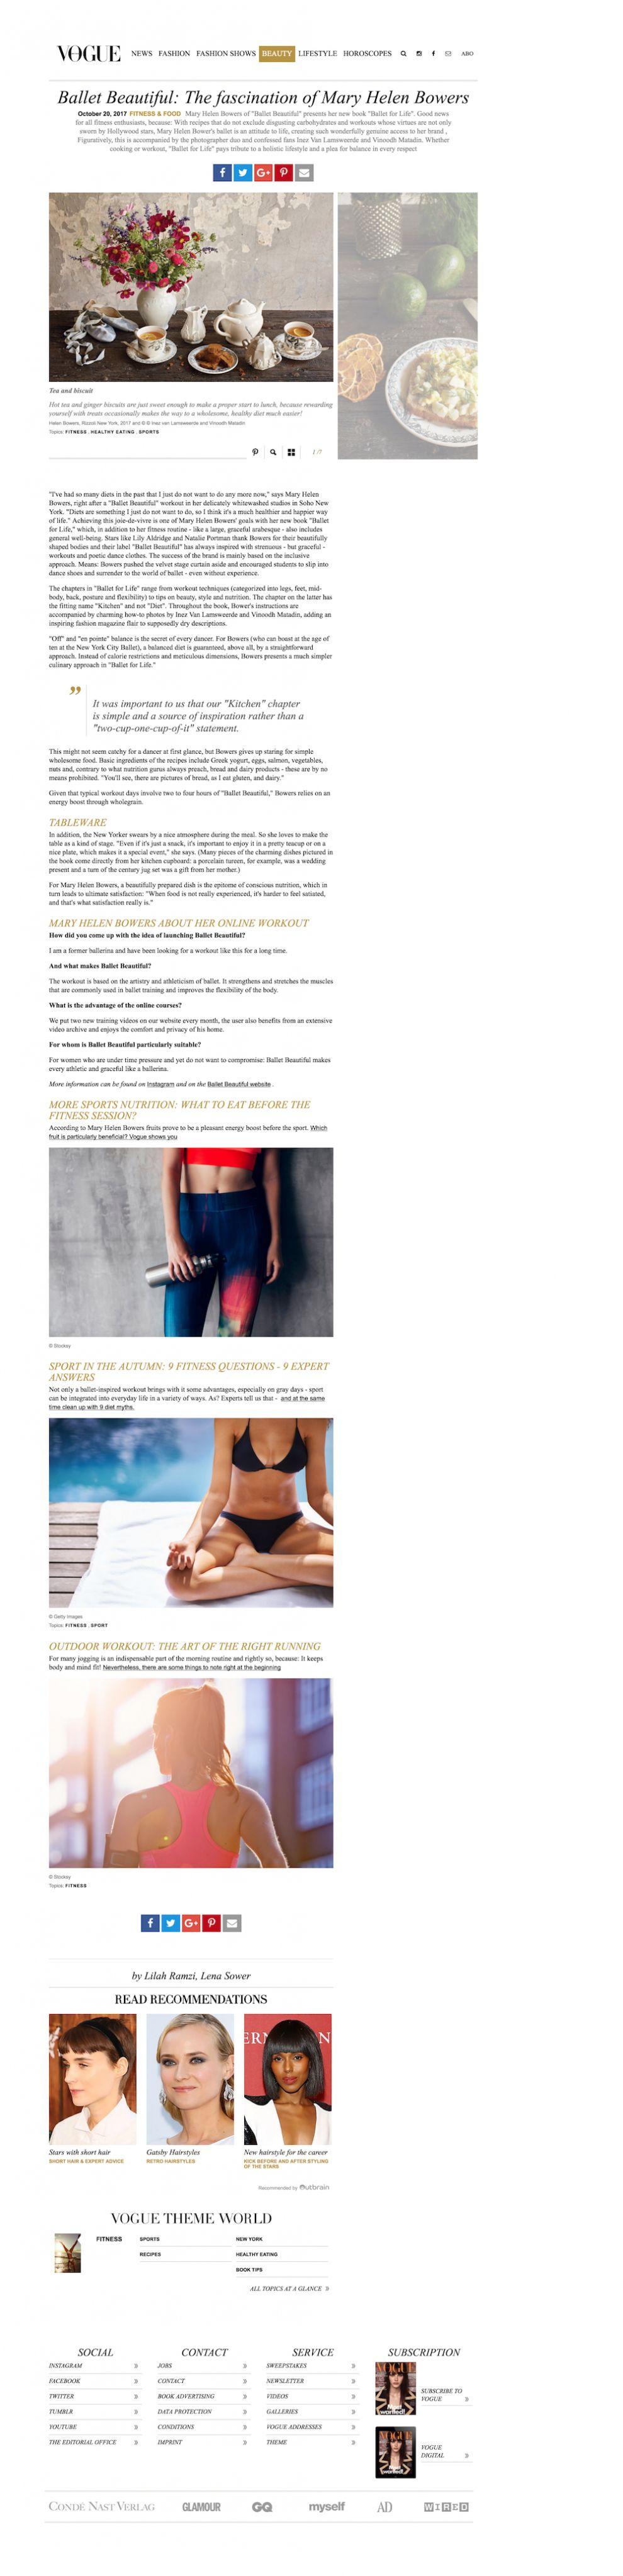 Vogue Minimal Website Design